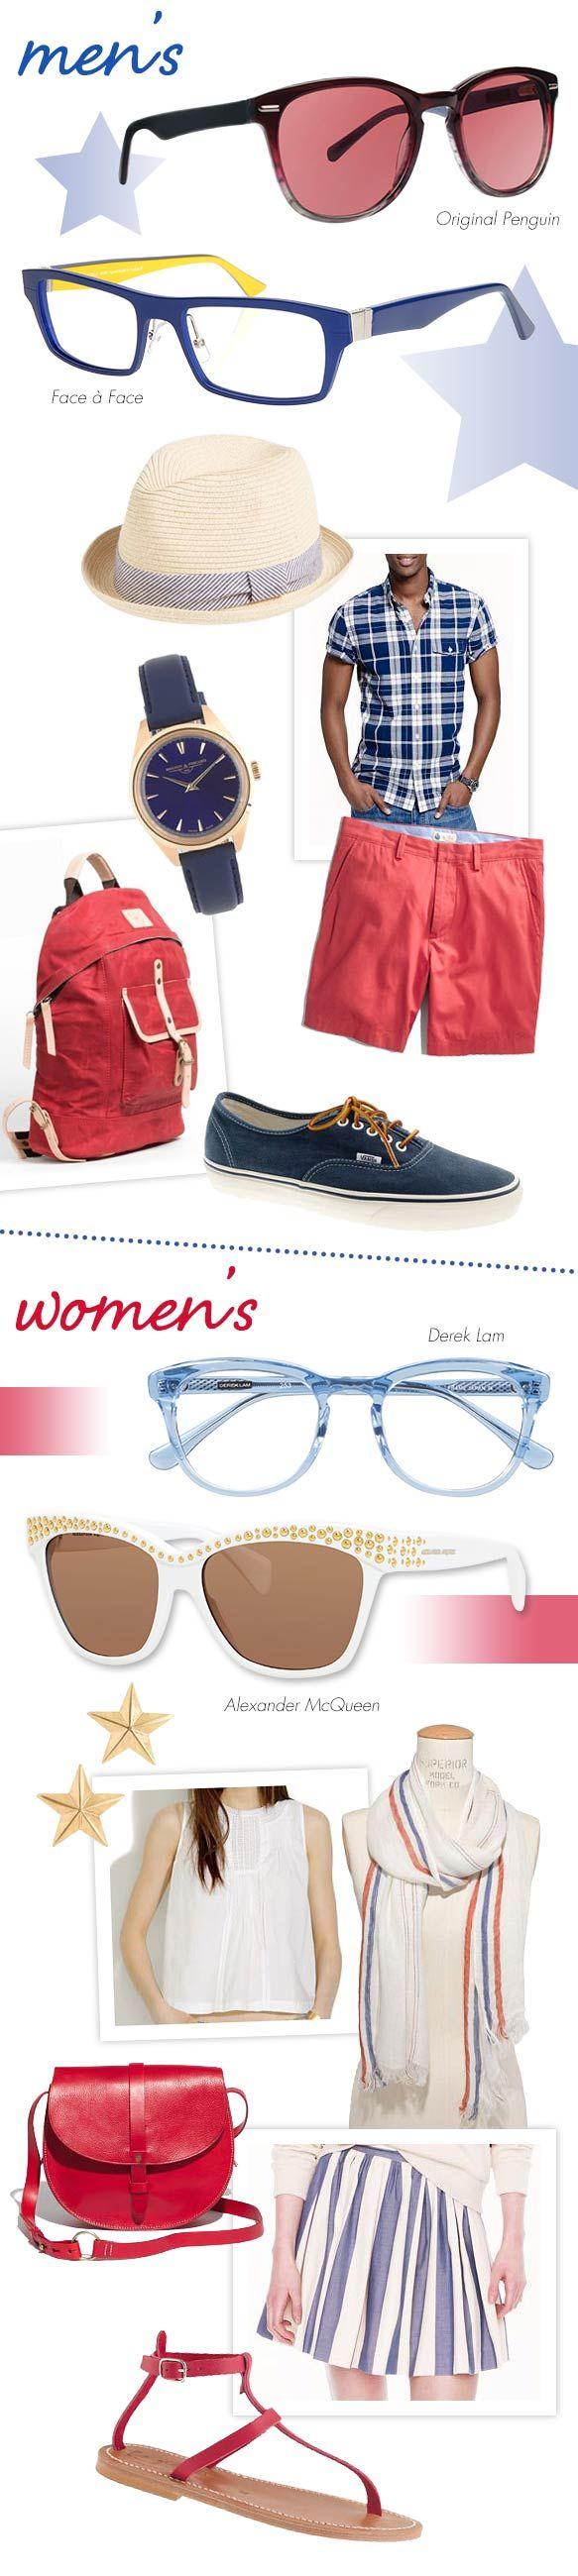 Specs, Shades + Garb for Patriotic Style: http://eyecessorizeblog.com/?p=5966: Shades, Events, Garb, Eyewear, Patriotic Style, Specs